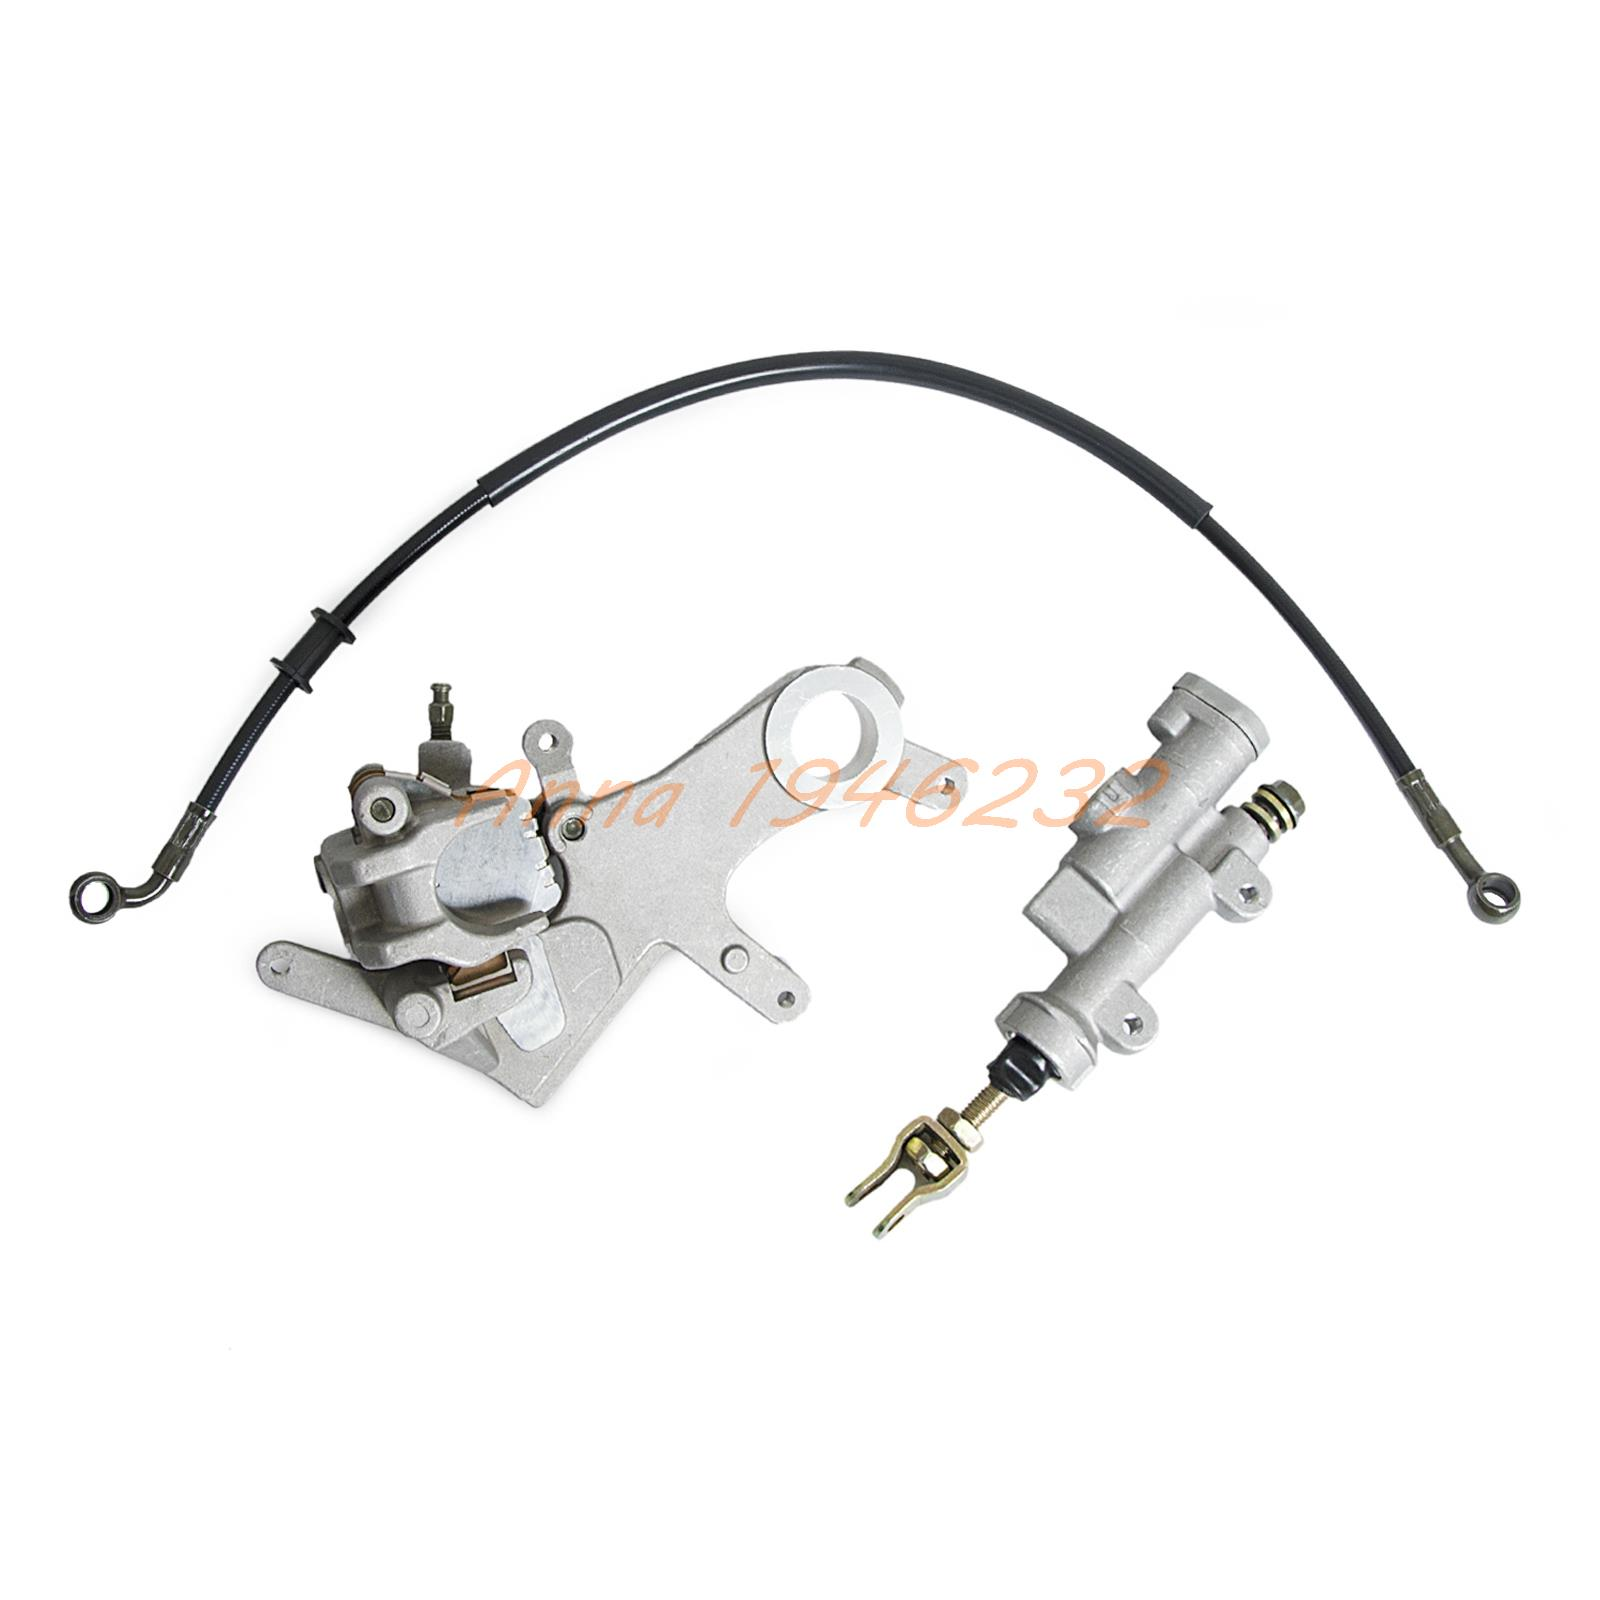 Суппорт заднего тормоза & главный цилиндр для Honda CRF250X 04-09 ЦРФ 250Х 2012-2013